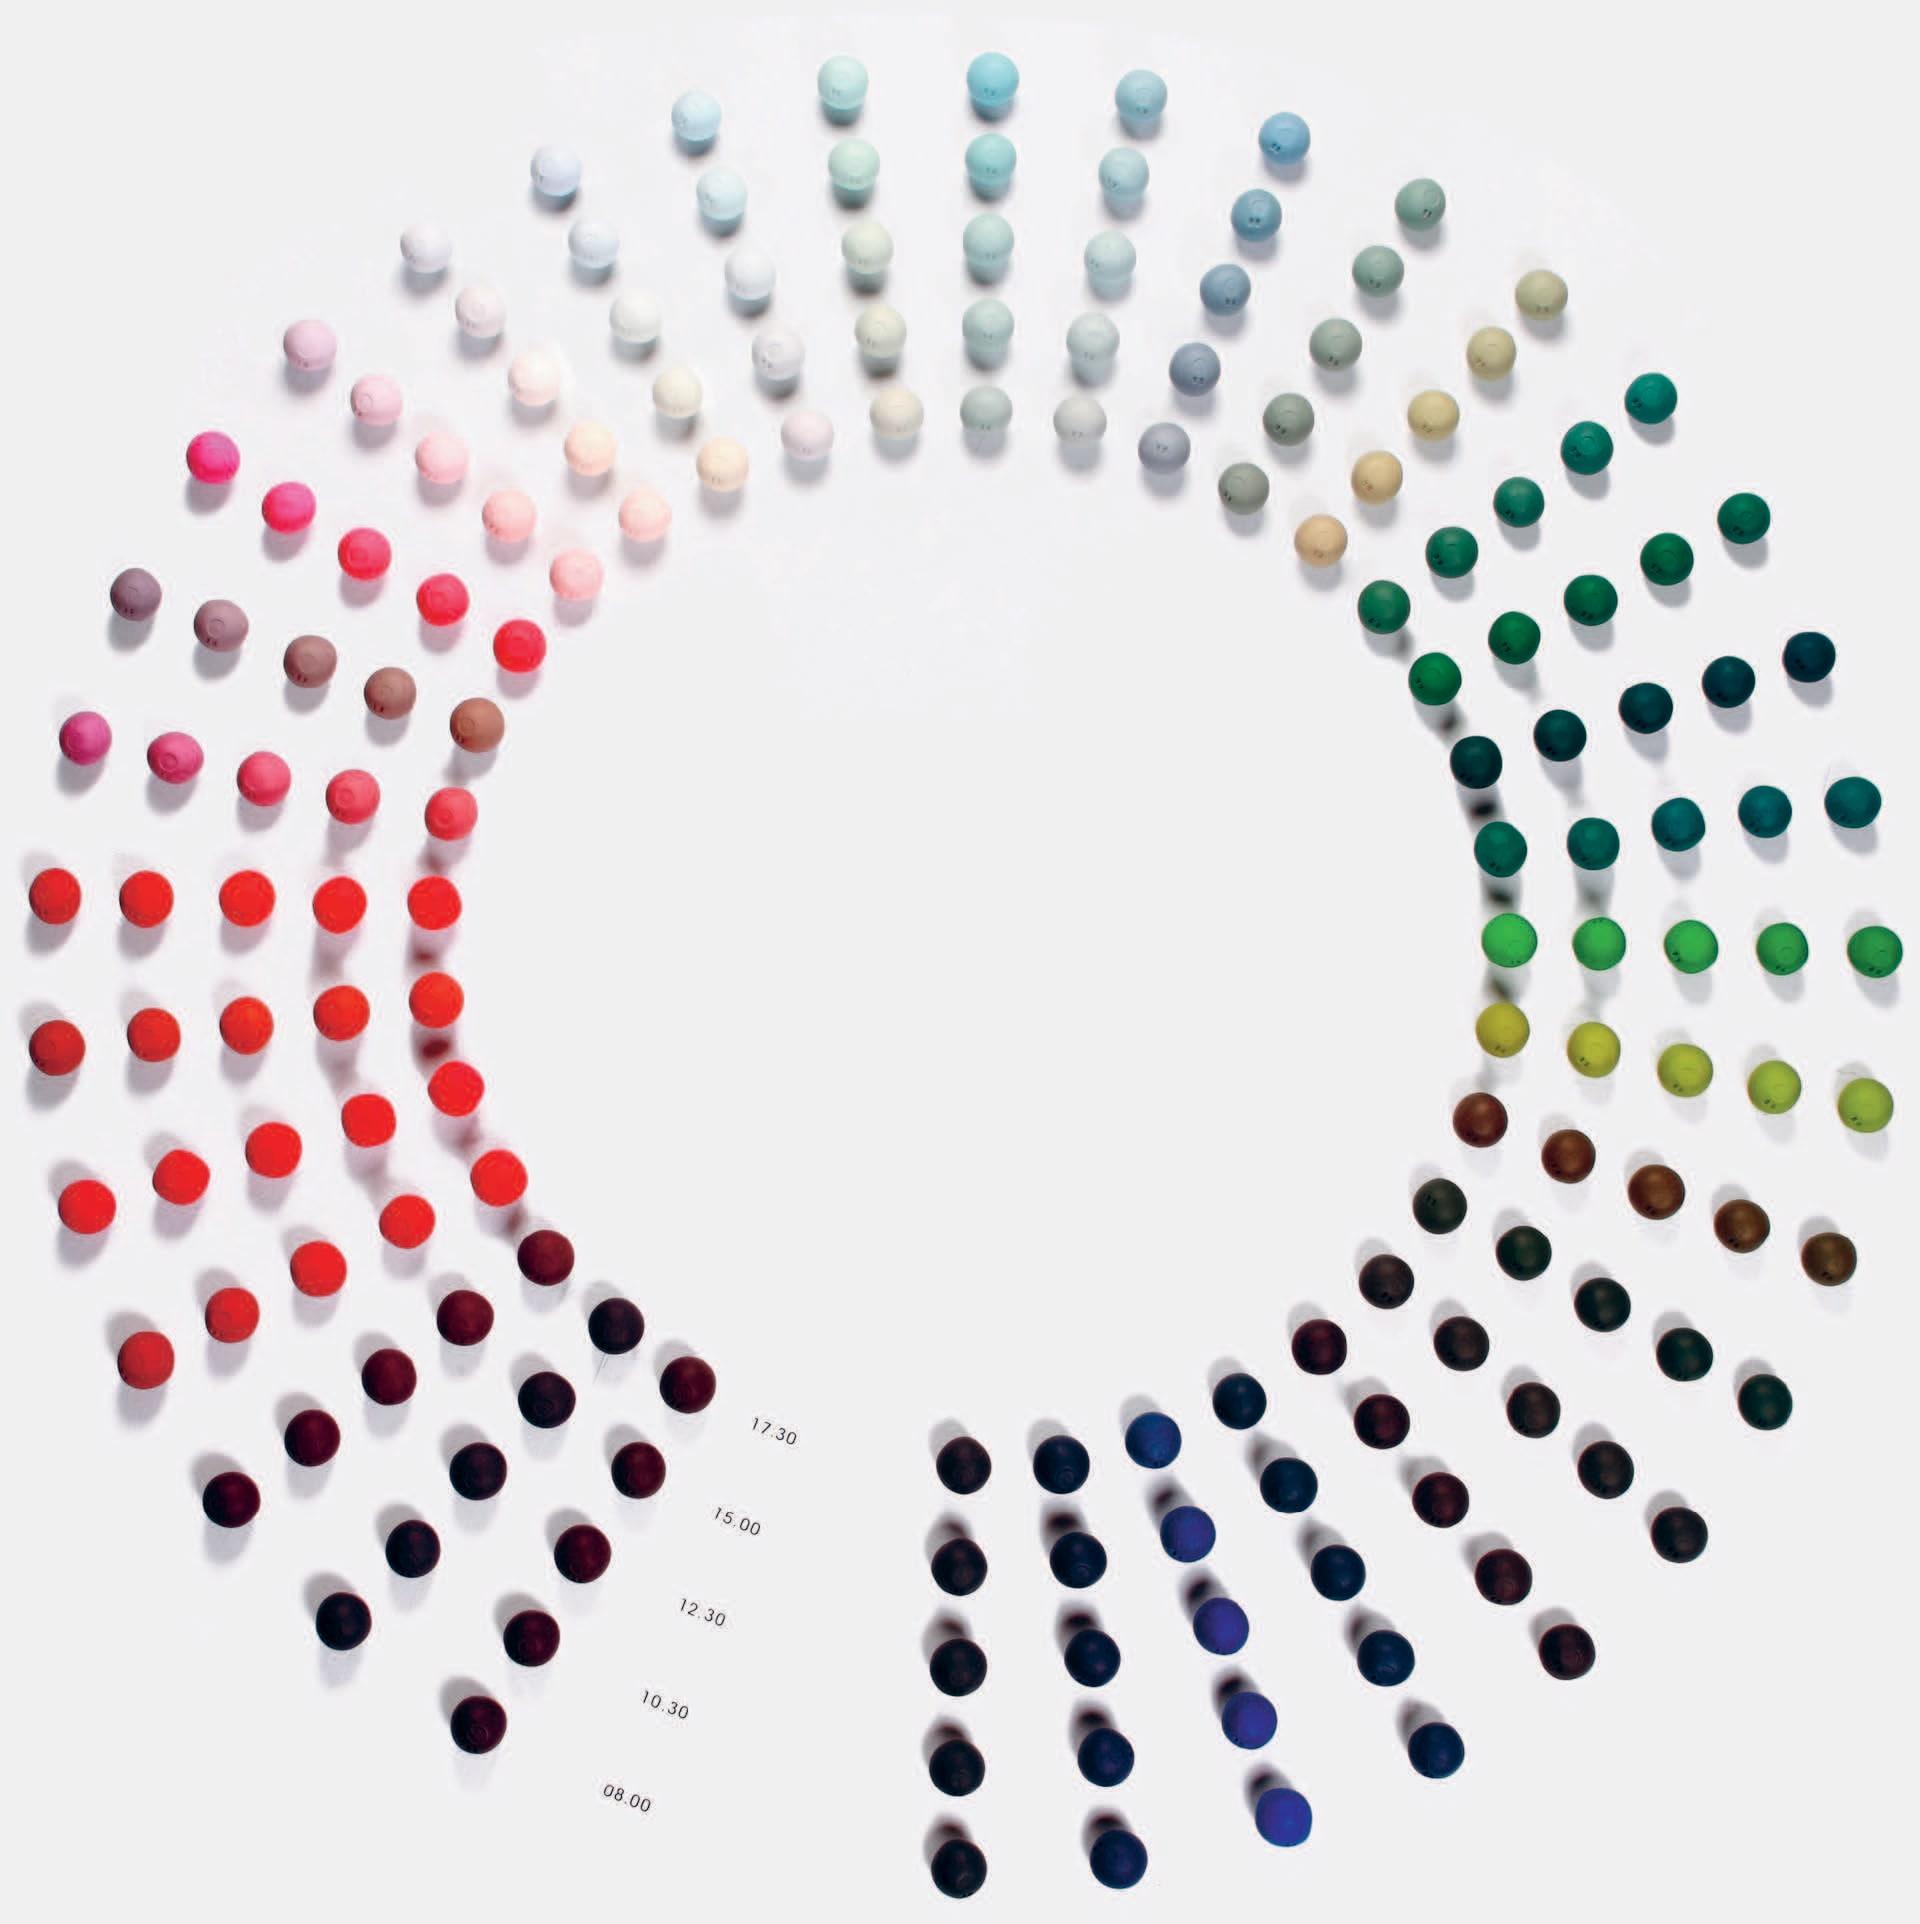 The secrets of color